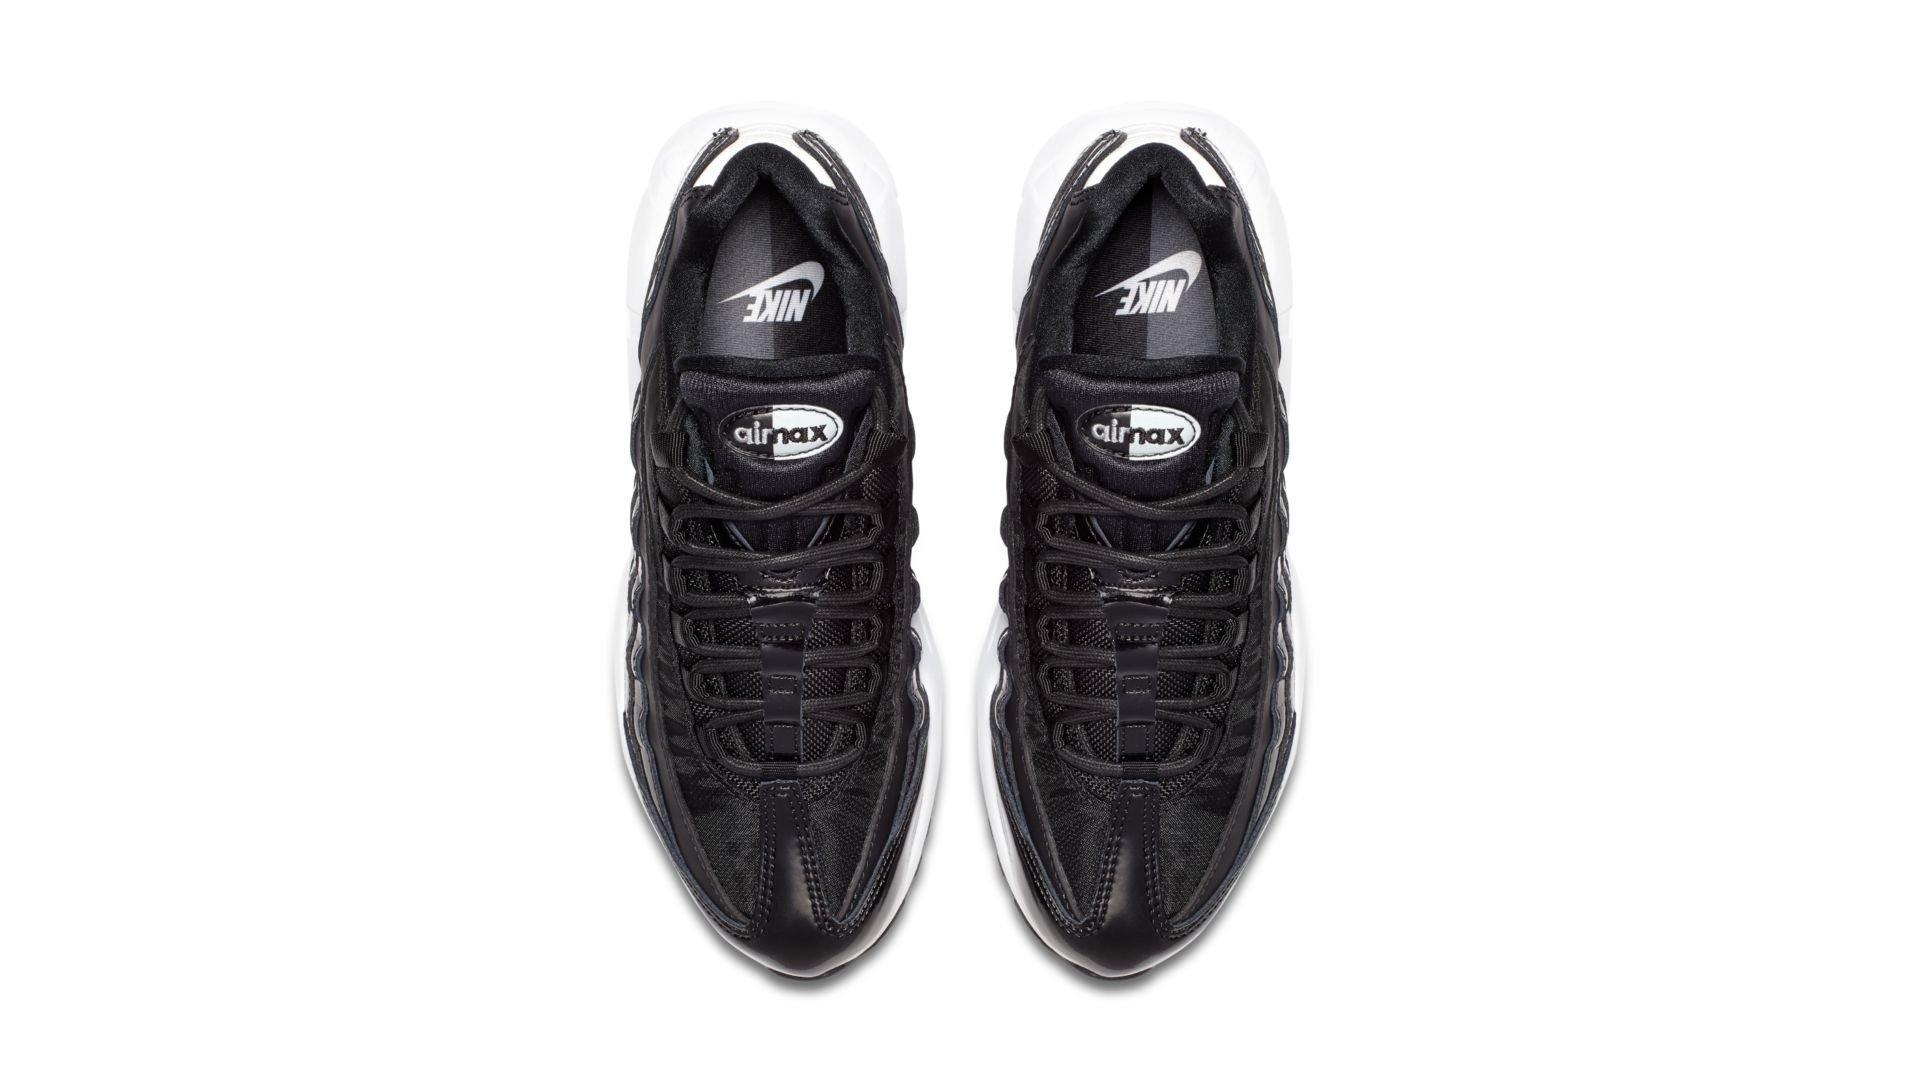 Nike Air Max 95 AH8697-001